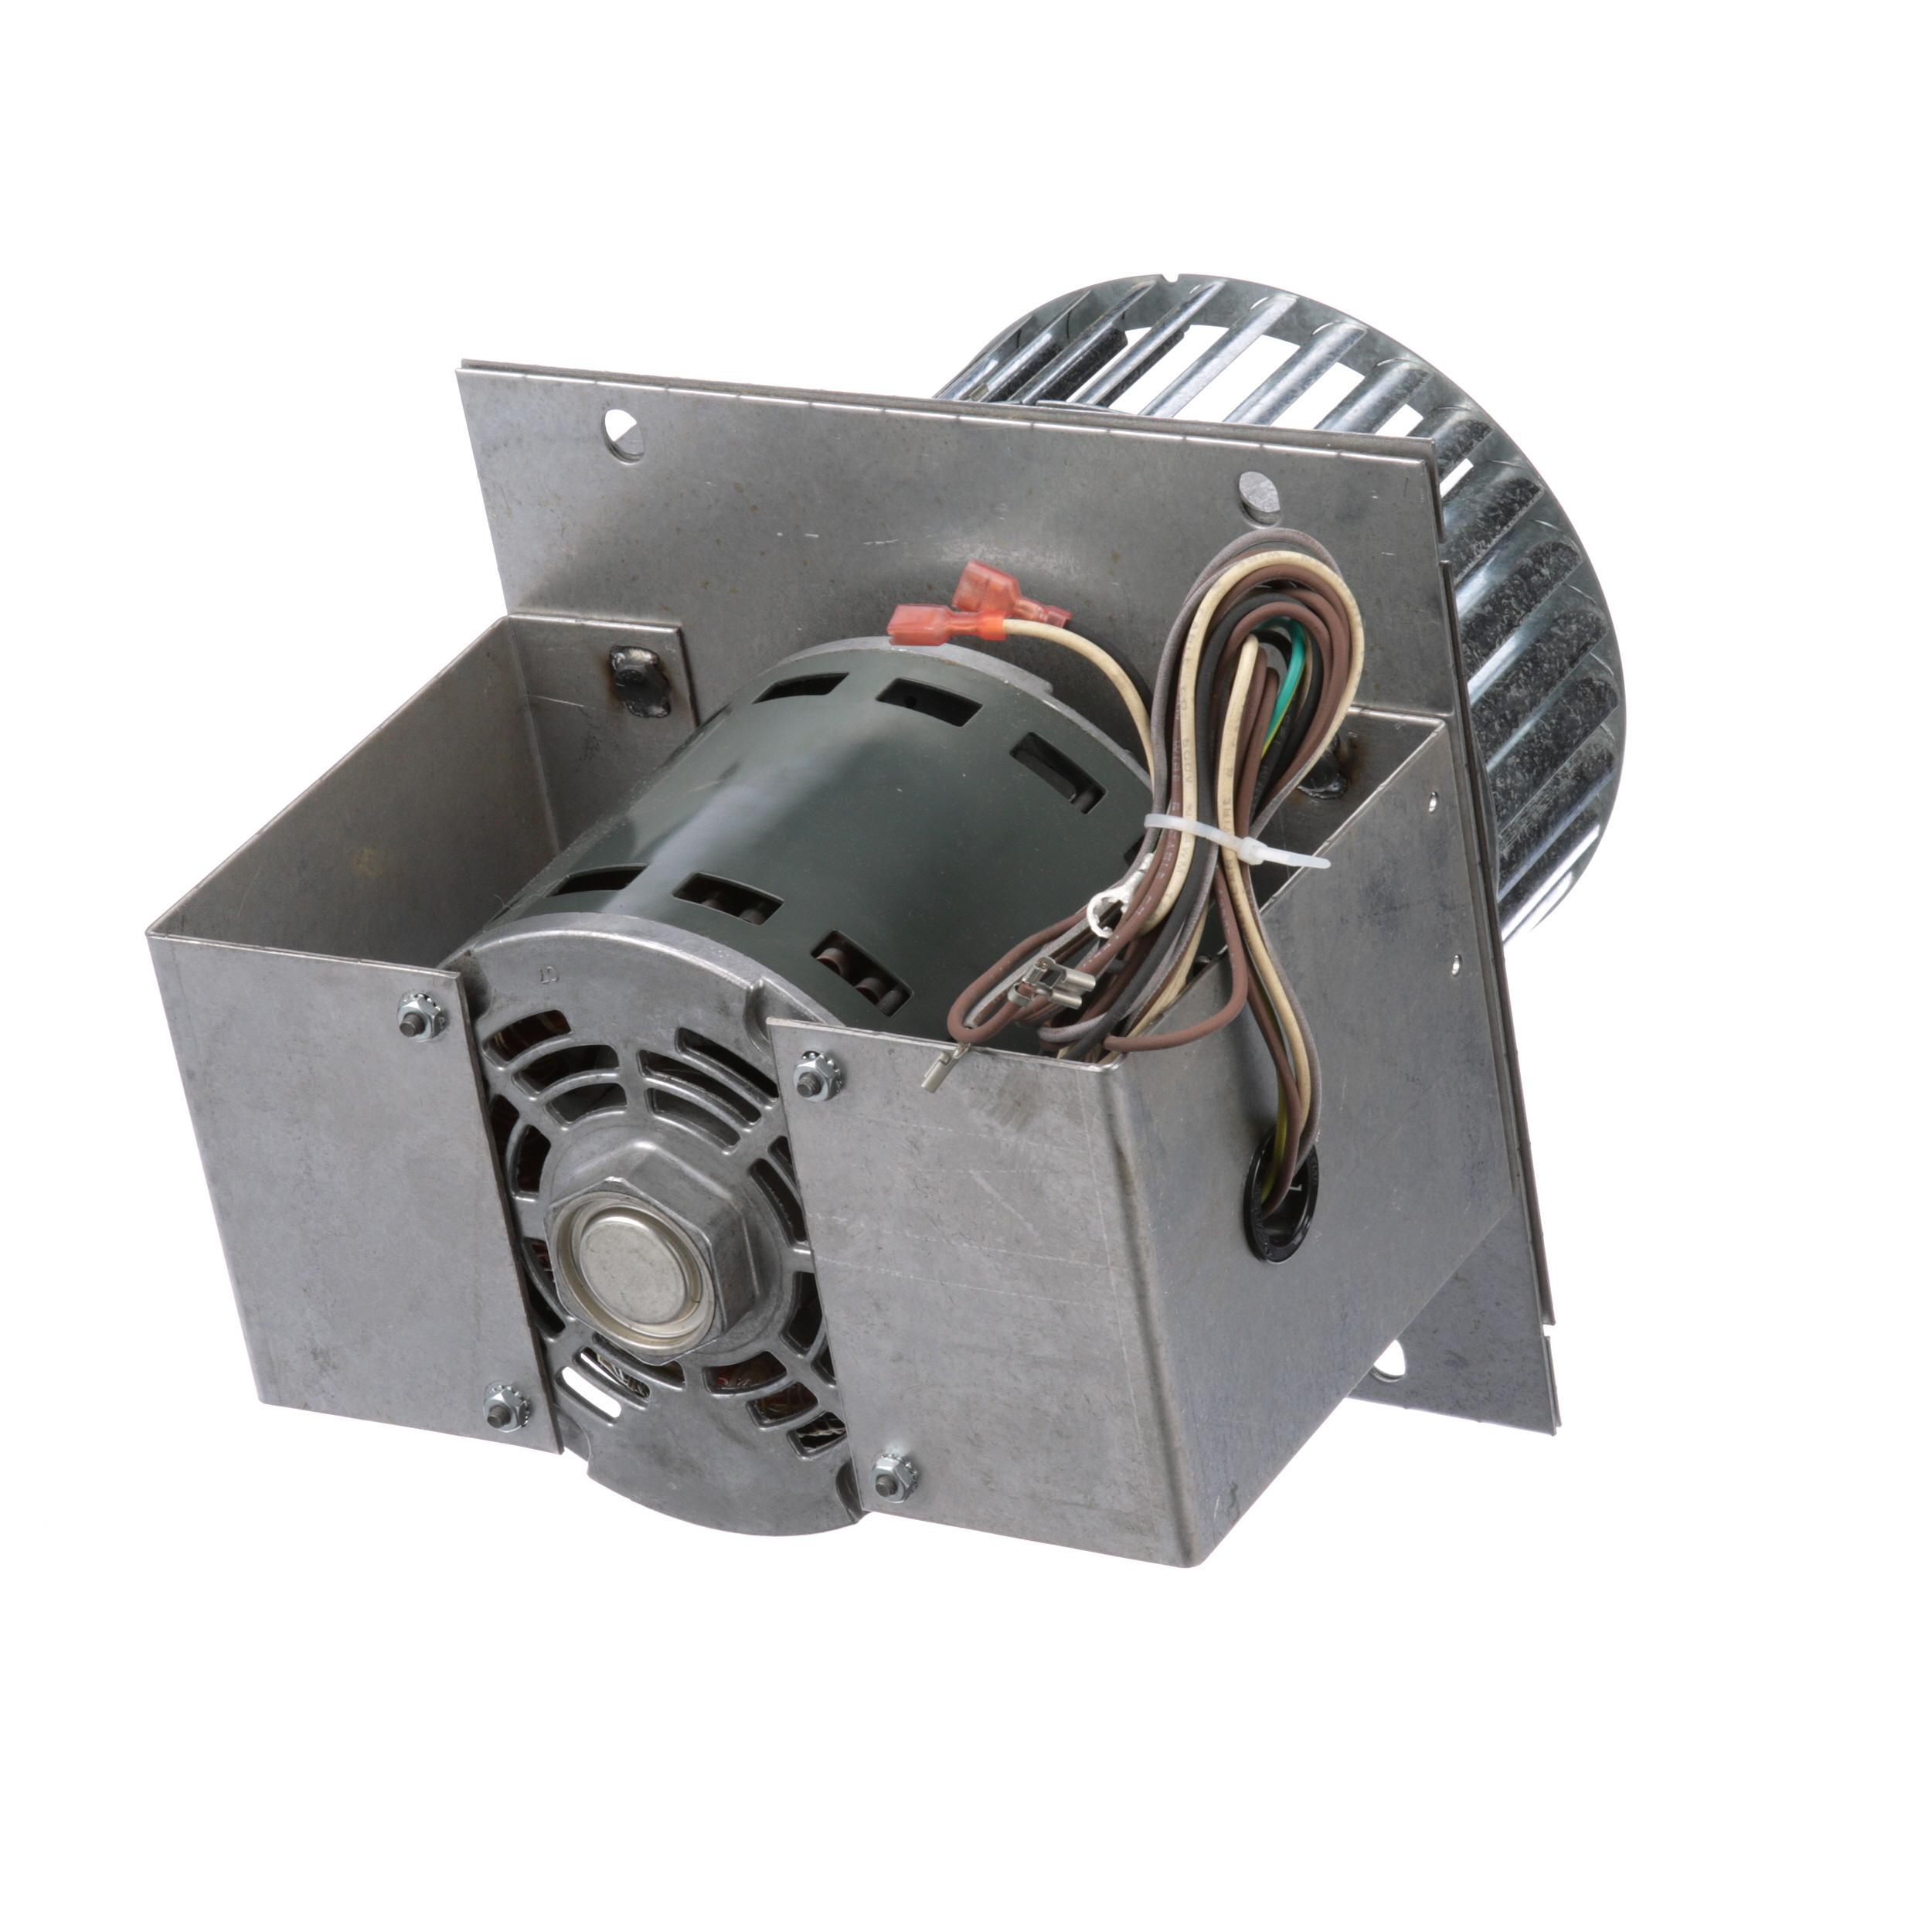 Garland motor pocket b a apo part ck1636599 for A and b motors